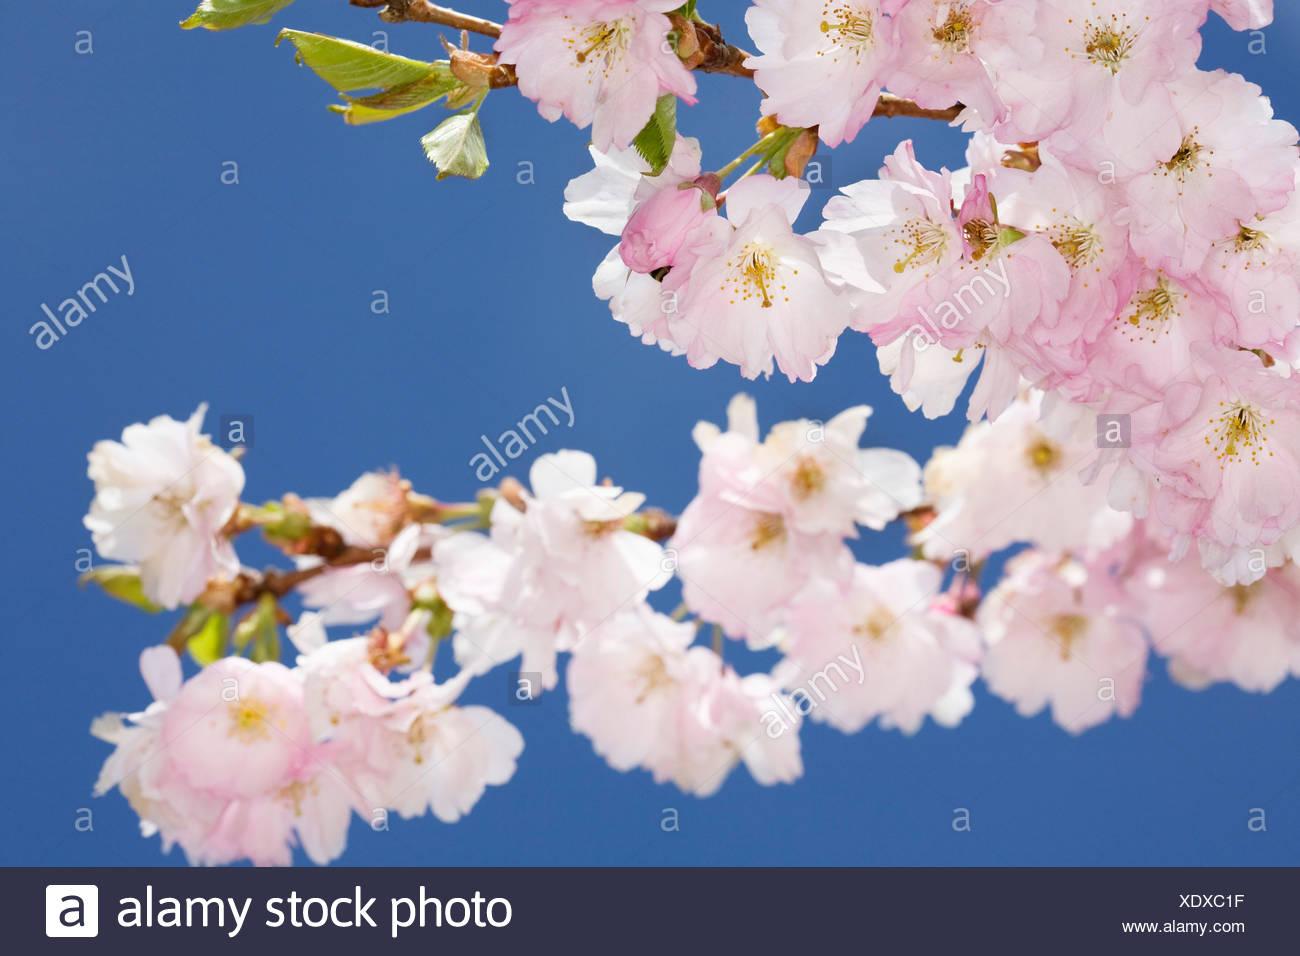 Spring Flowers In Europe Germany Stock Photos & Spring Flowers In ...